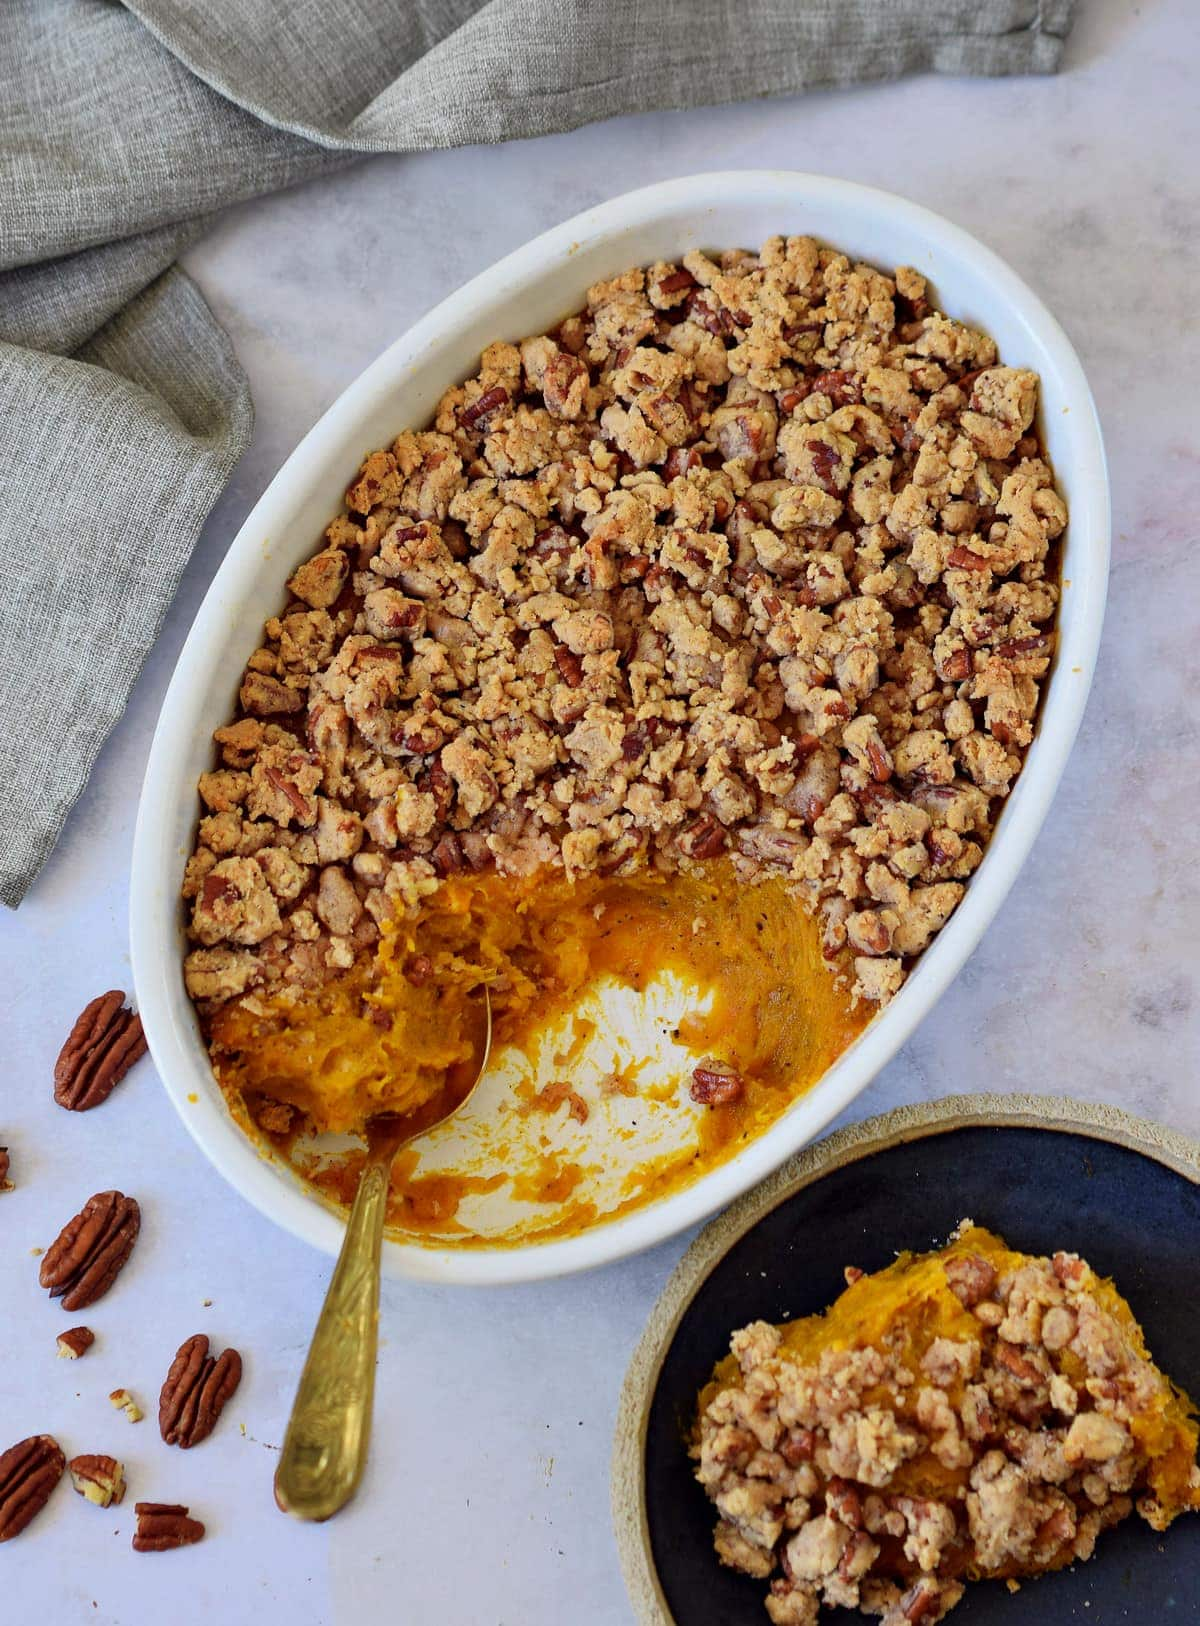 vegan Thanksgiving casserole with sweet potatoes